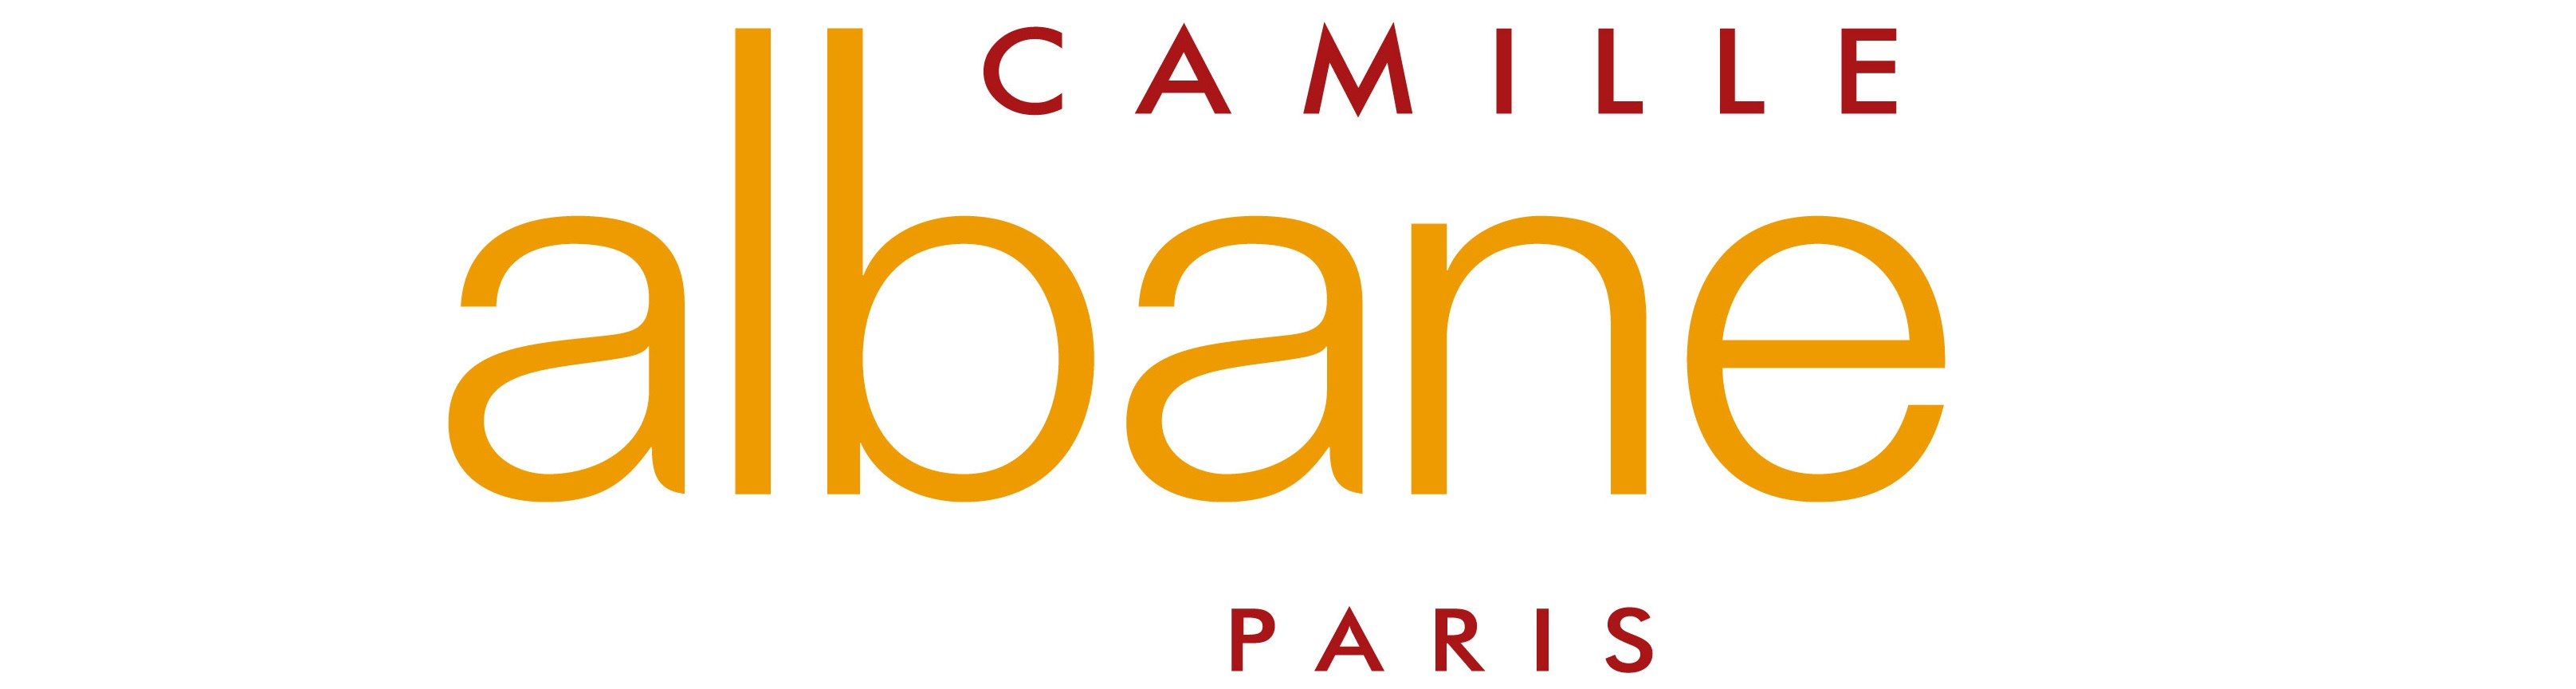 Camille Albane - La Varenne St Hilaire 94